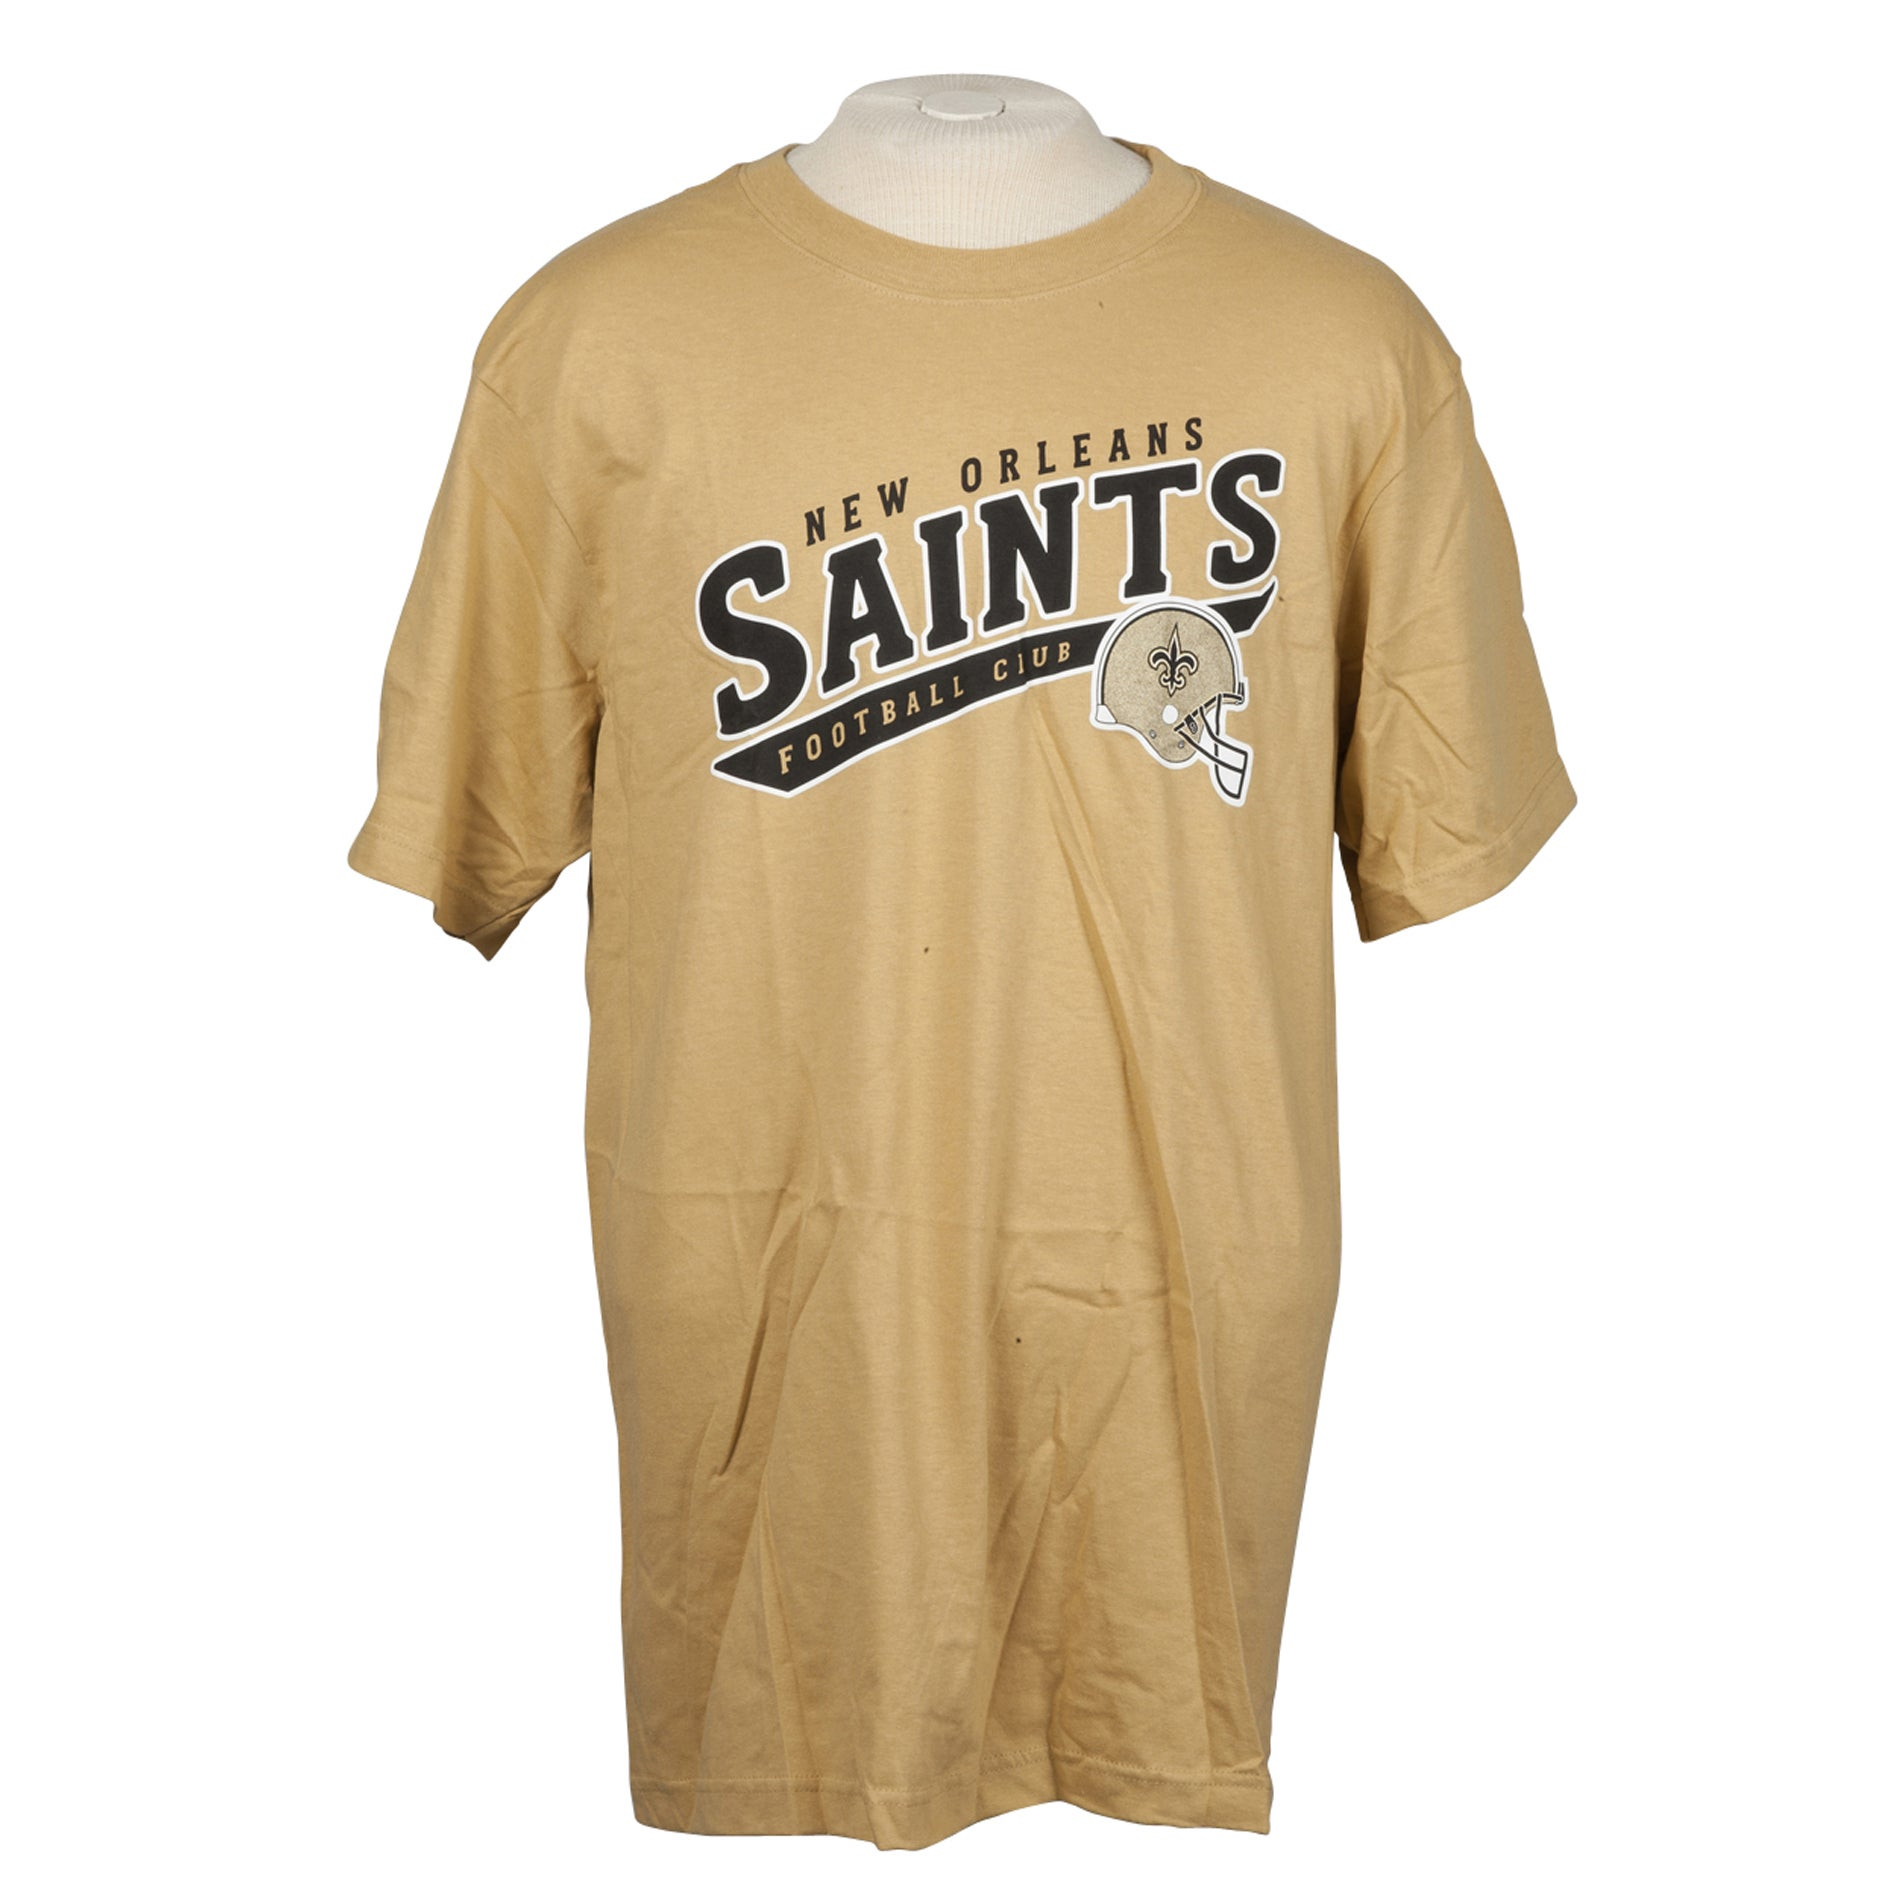 Reebok New Orleans Saints Tan Team T-shirt